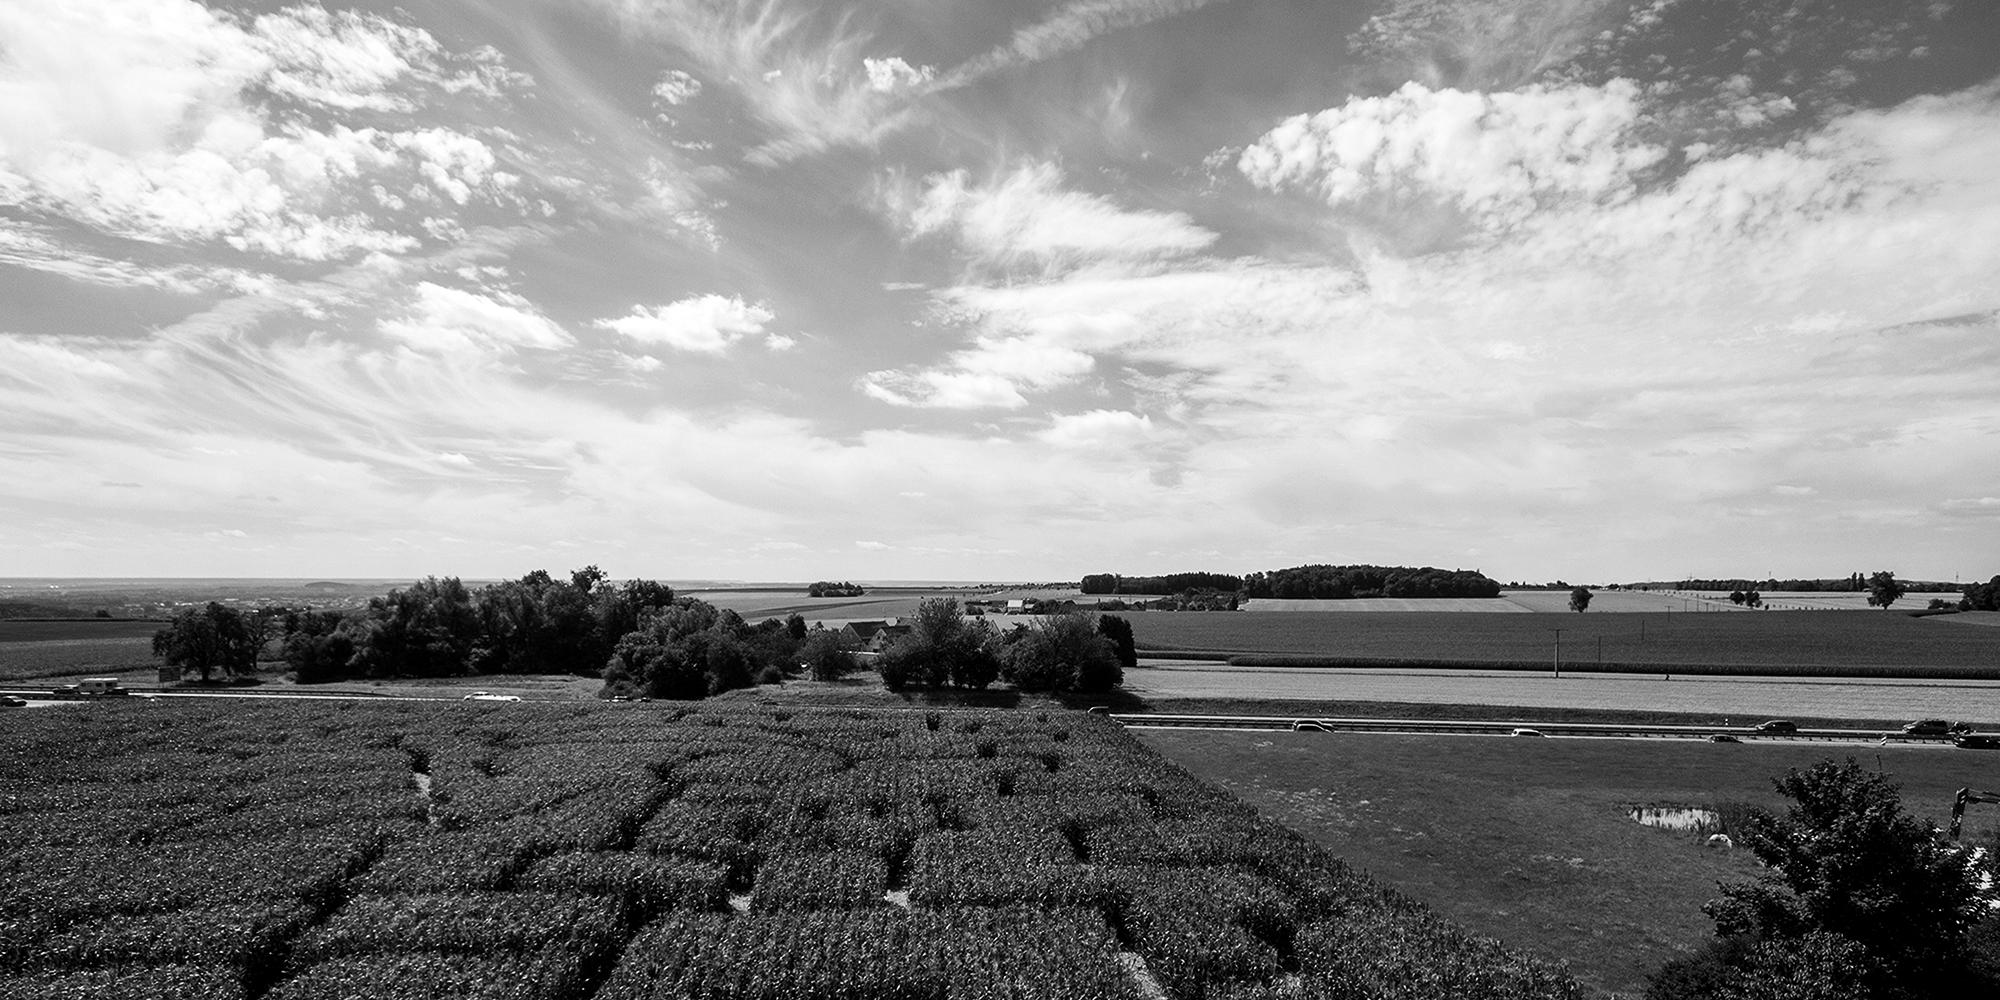 Umgebung monteurswohnungen in ulm seligweiler - Gartenbau ulm umgebung ...